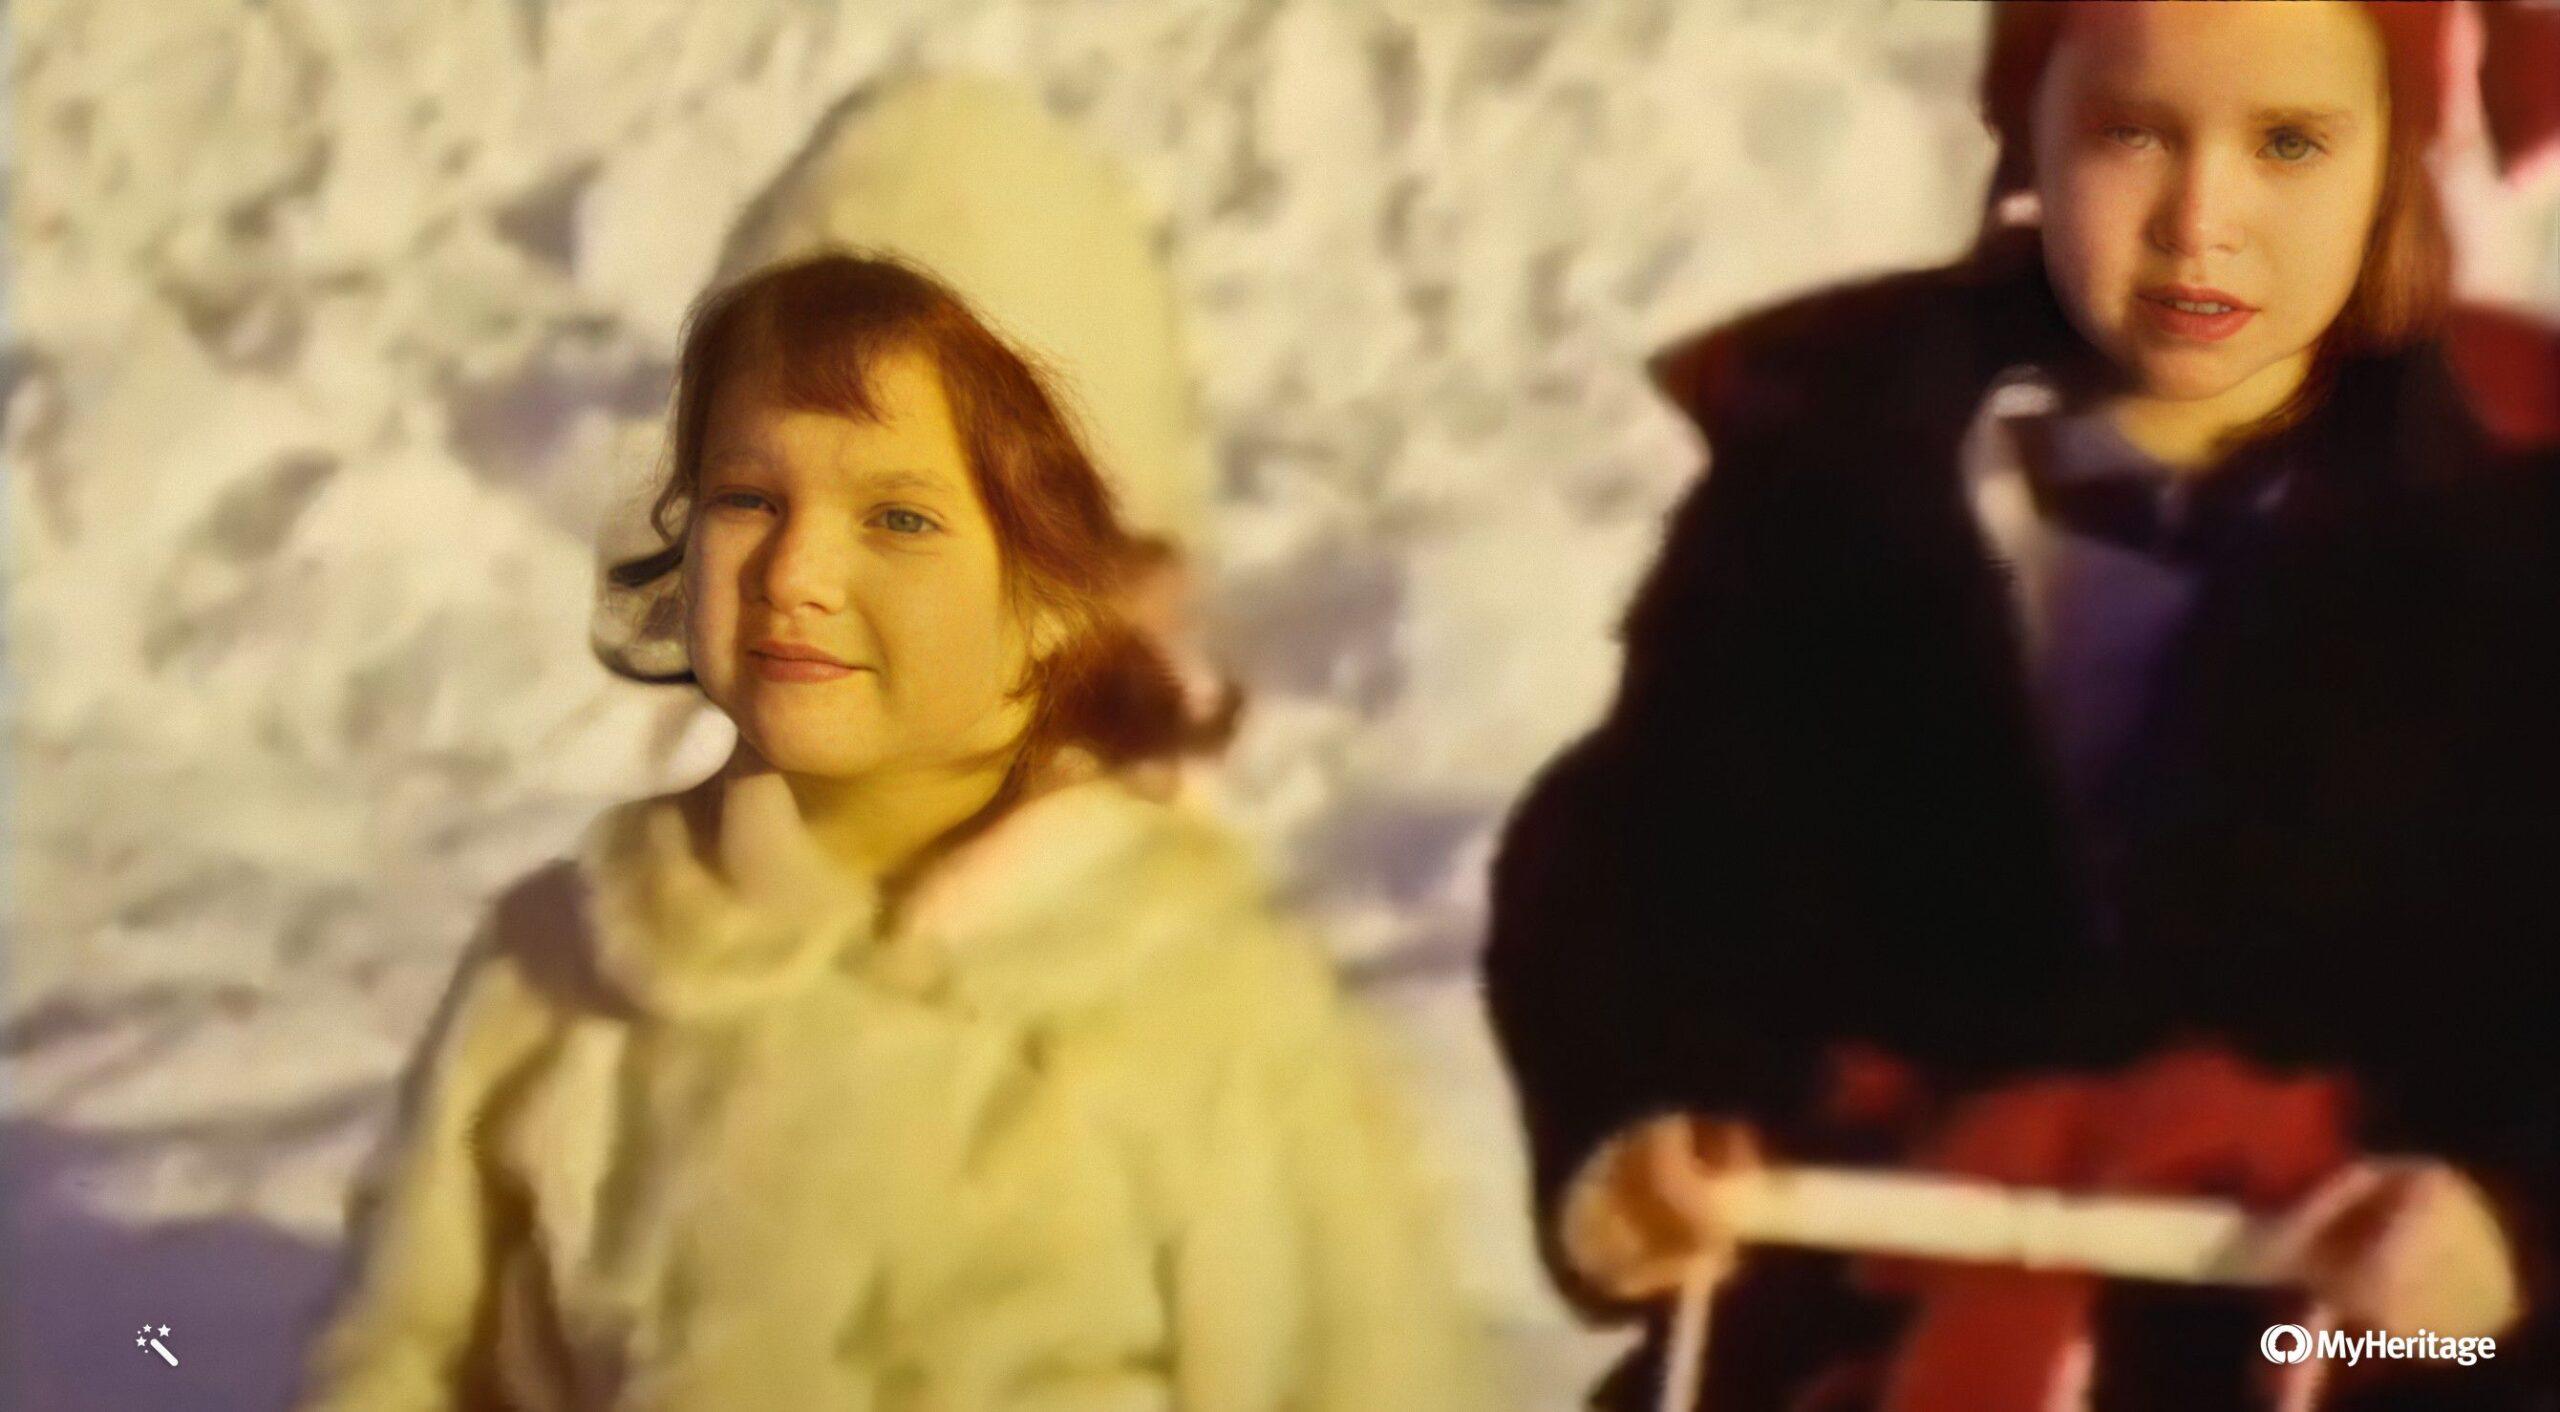 Historic Home Movies of Saint Andrews, N.B.